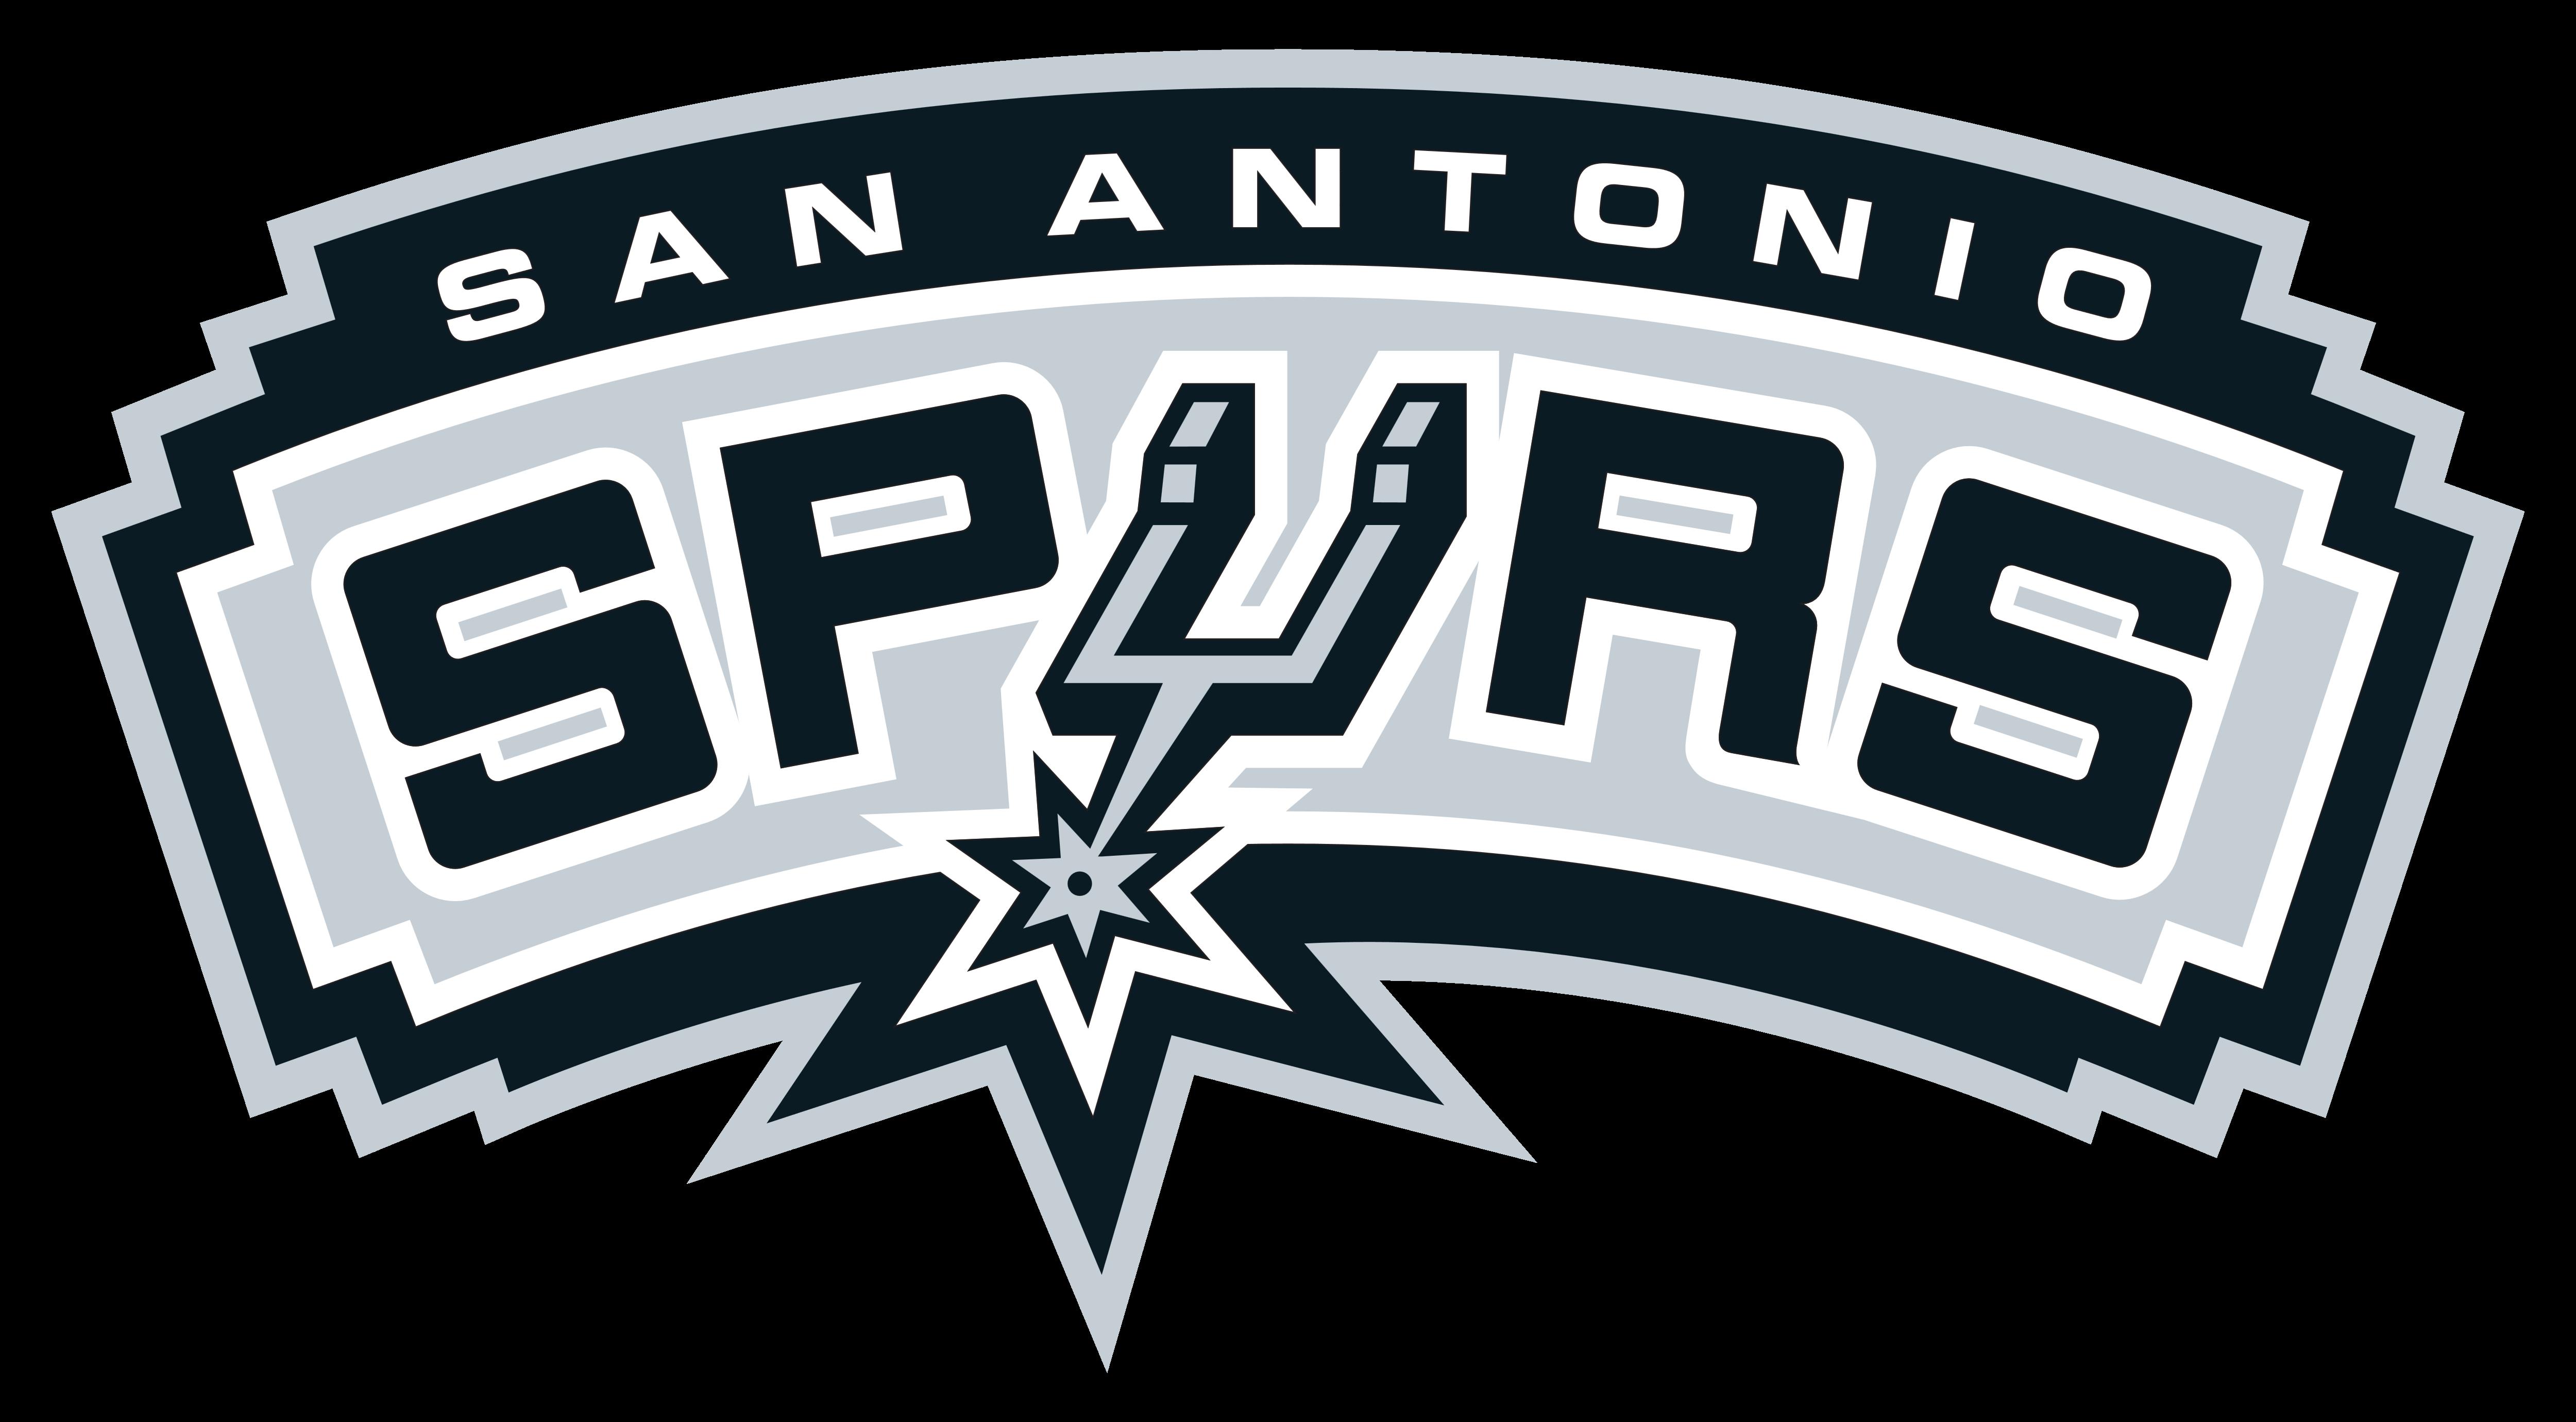 San Antonio Spurs Logos Download